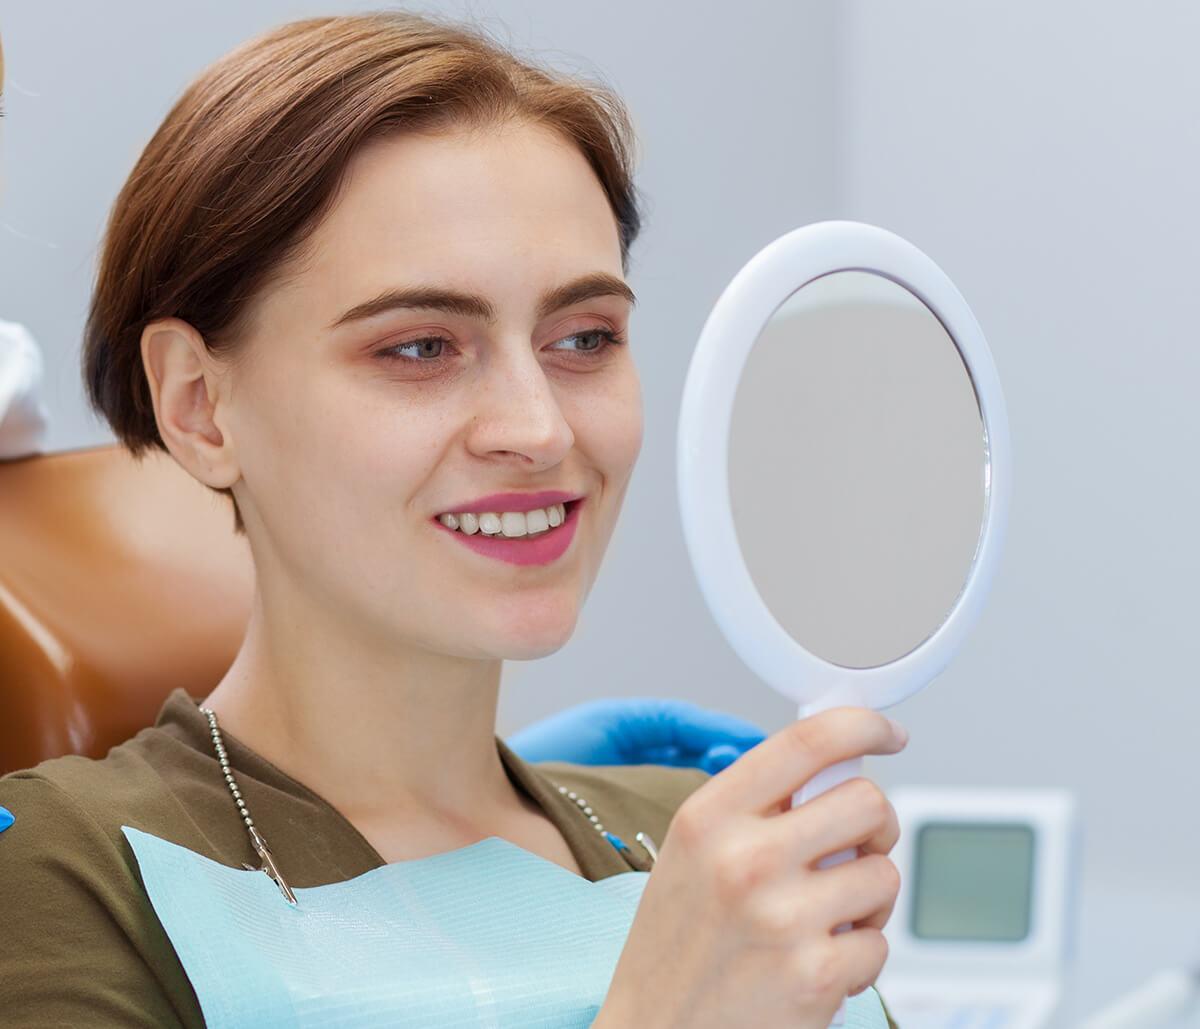 CEREC Dental Crowns AT Dental Health & Aesthetics Center IN Aliso Viejo CA Area